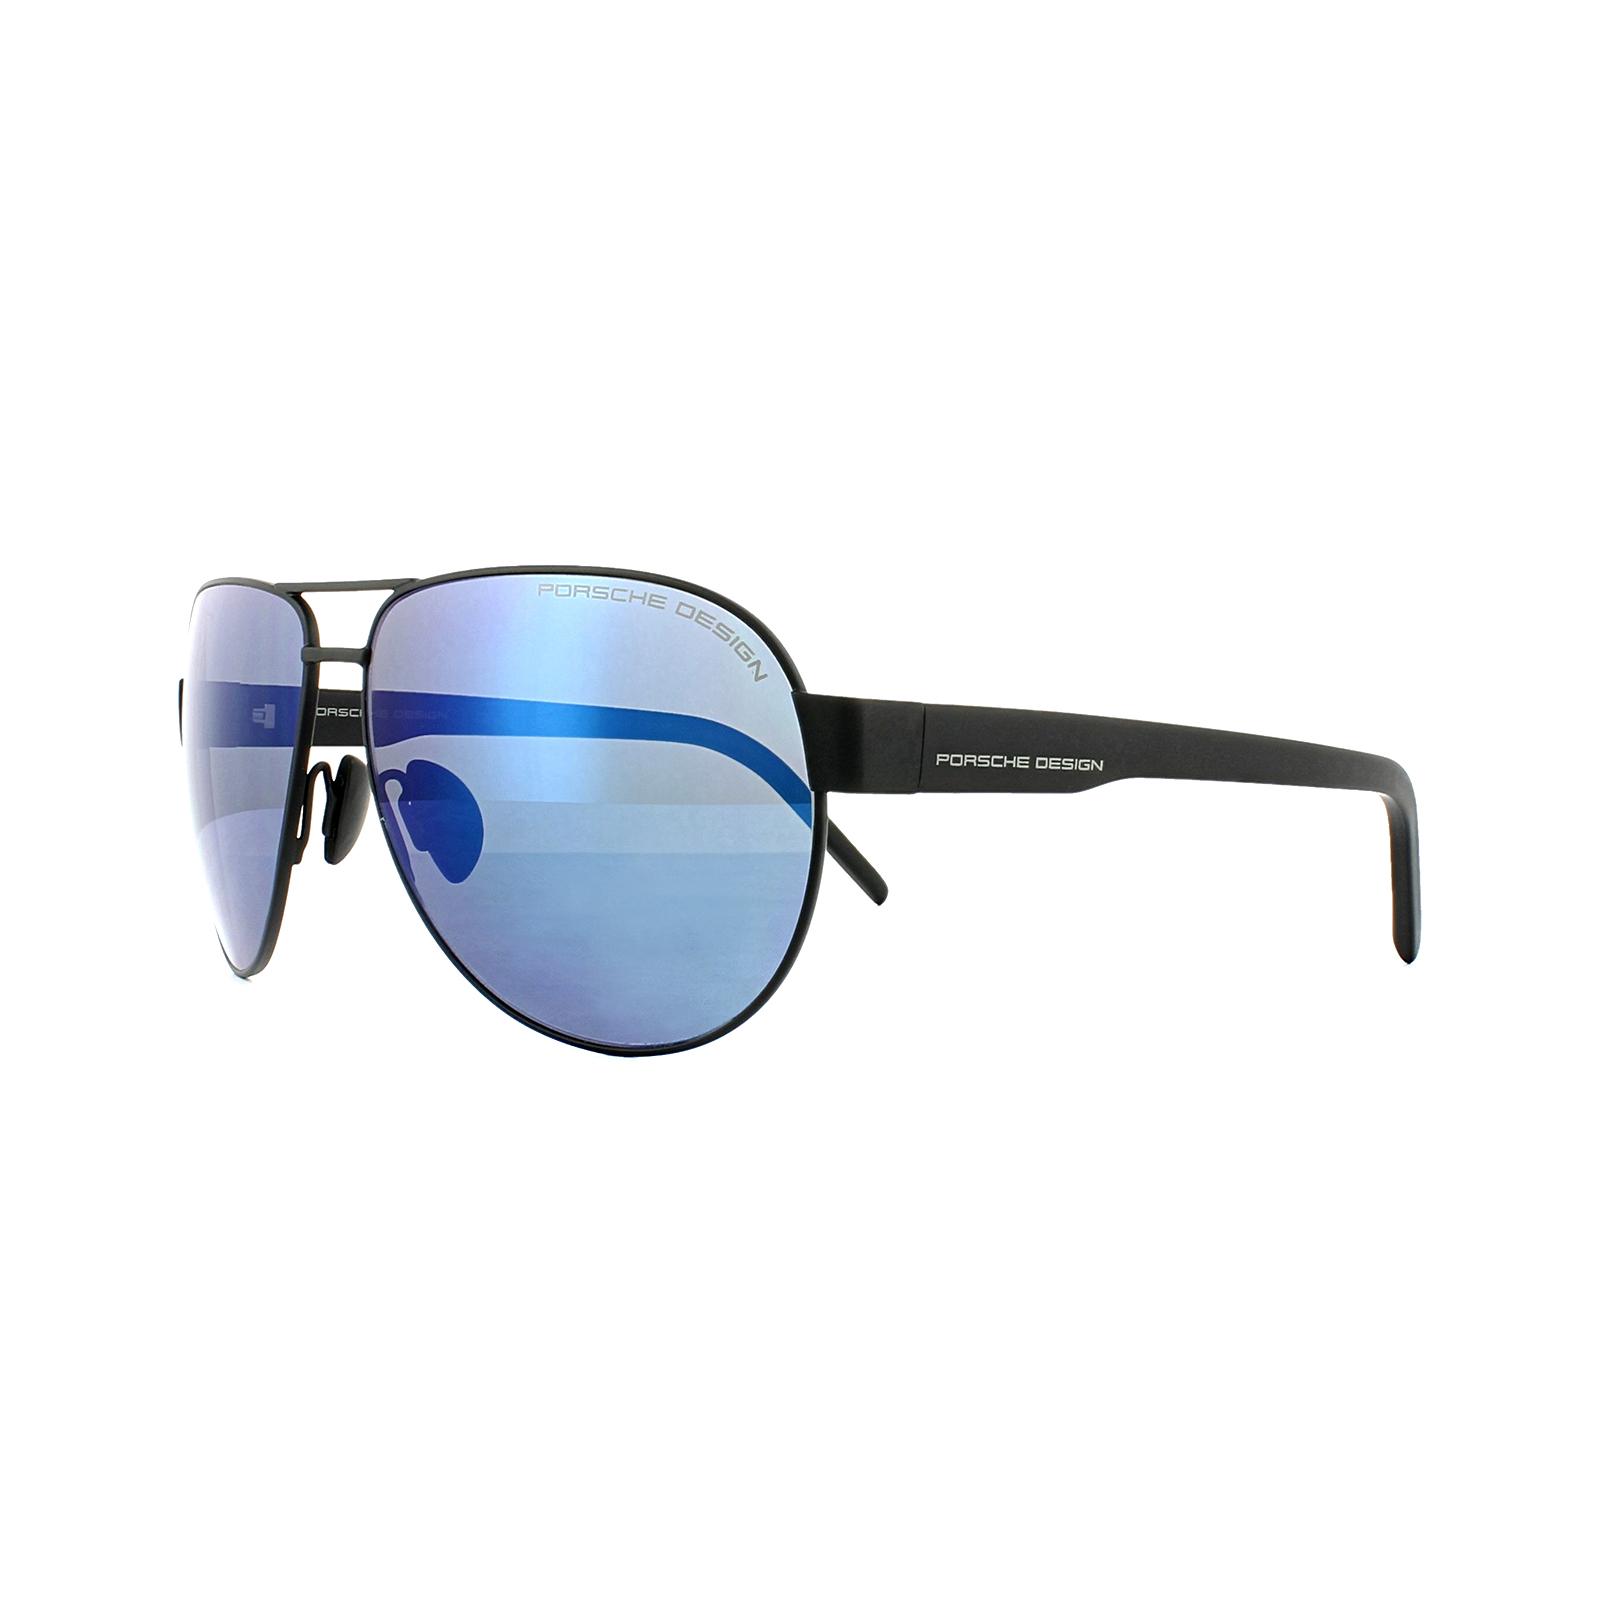 642455d47ad1 Cheap Porsche Design P8632 Sunglasses - Discounted Sunglasses